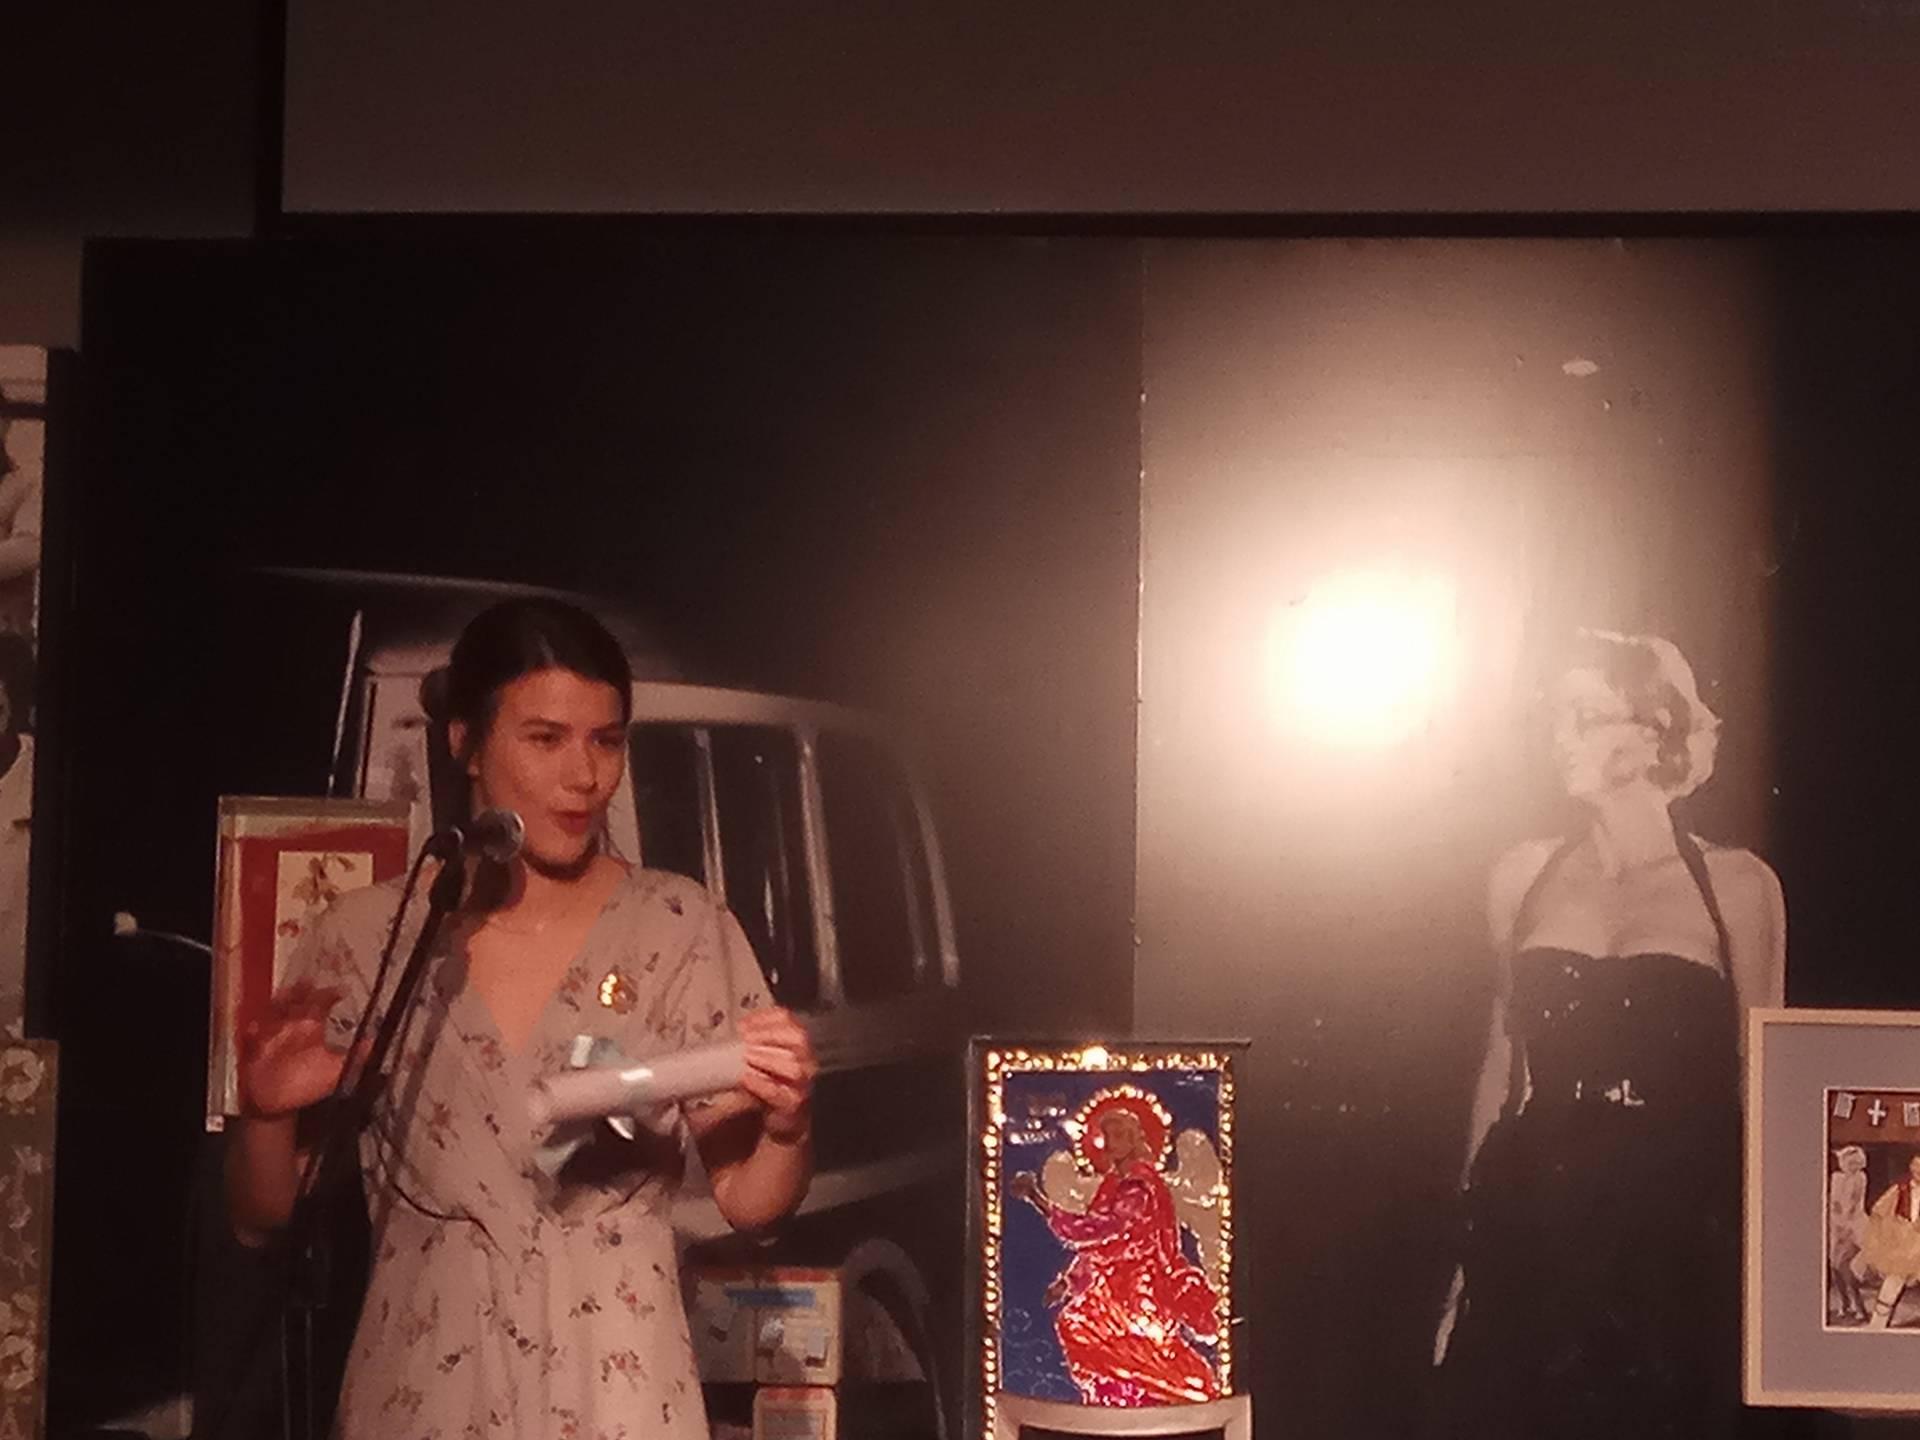 6a4ae47011e7 Το βραβείο ανέρχεται σε 3.000 ευρώ και η τιμώμενη ηθοποιός κρατά για ένα  χρόνο την καρφίτσα της Μελίνας Μερκούρη